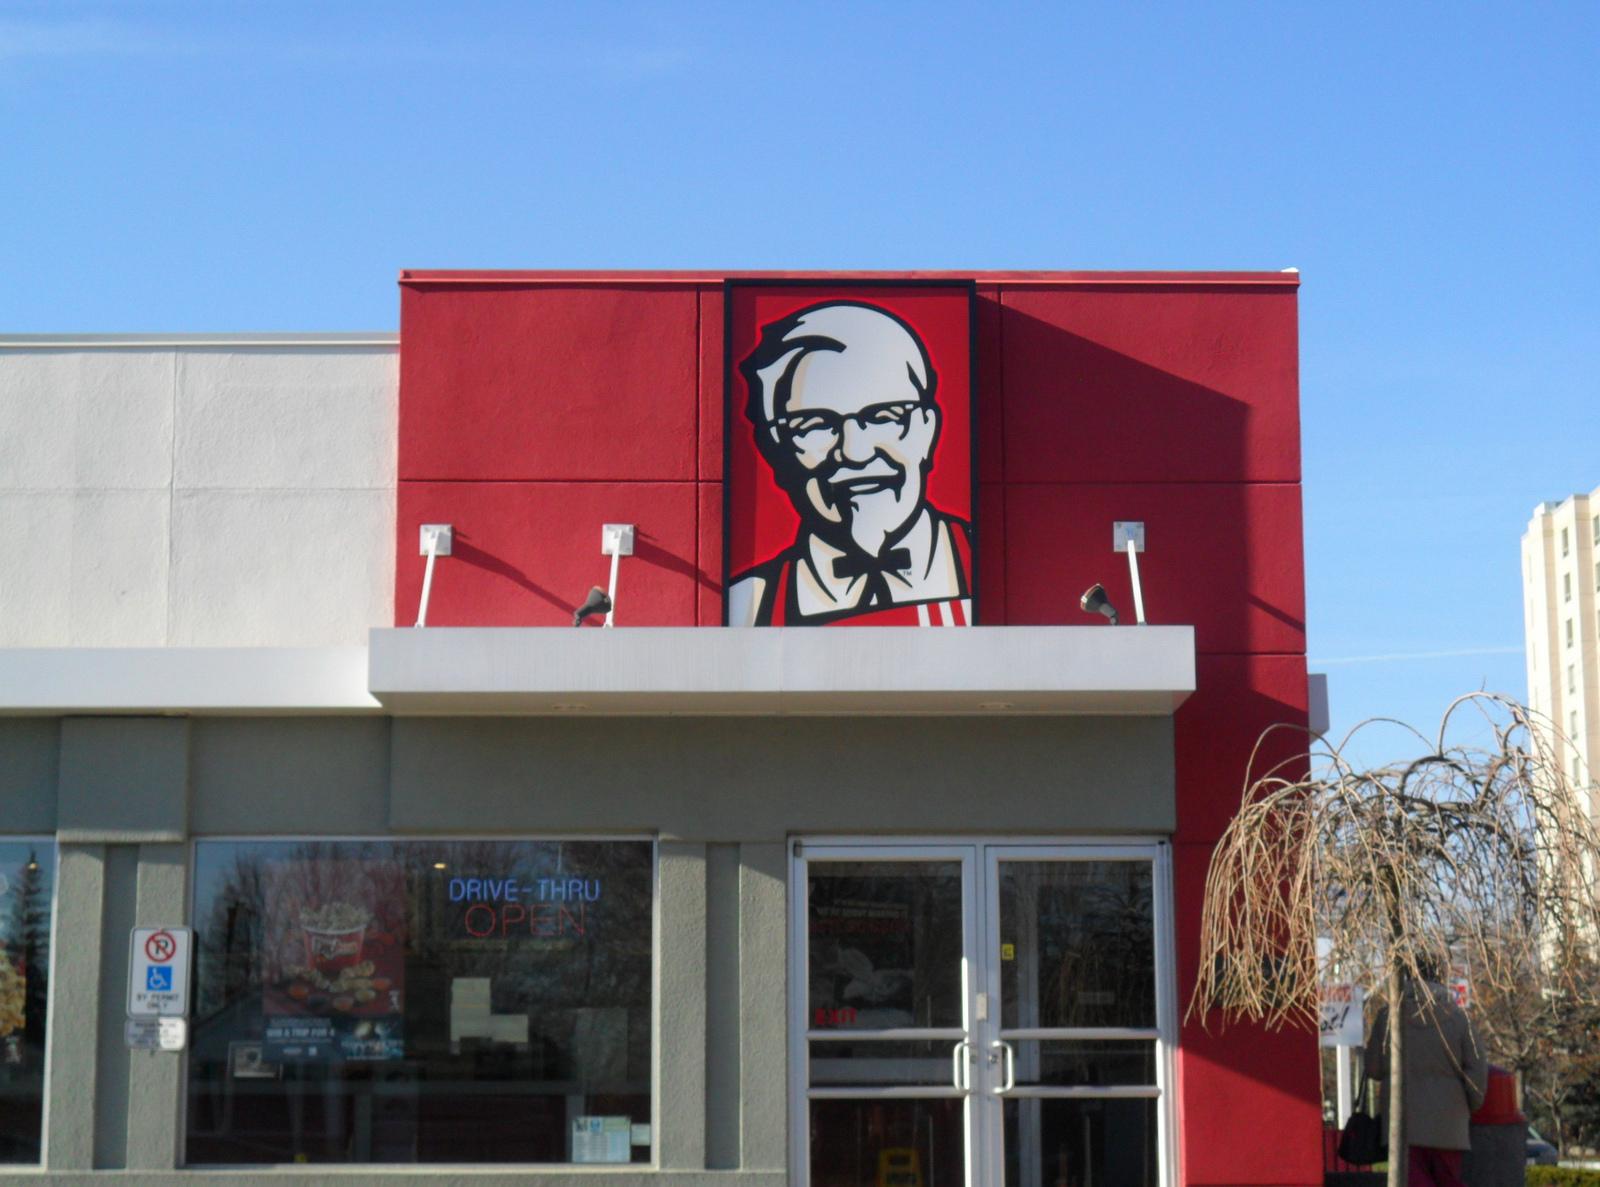 A newly remodeled KFC restaurant